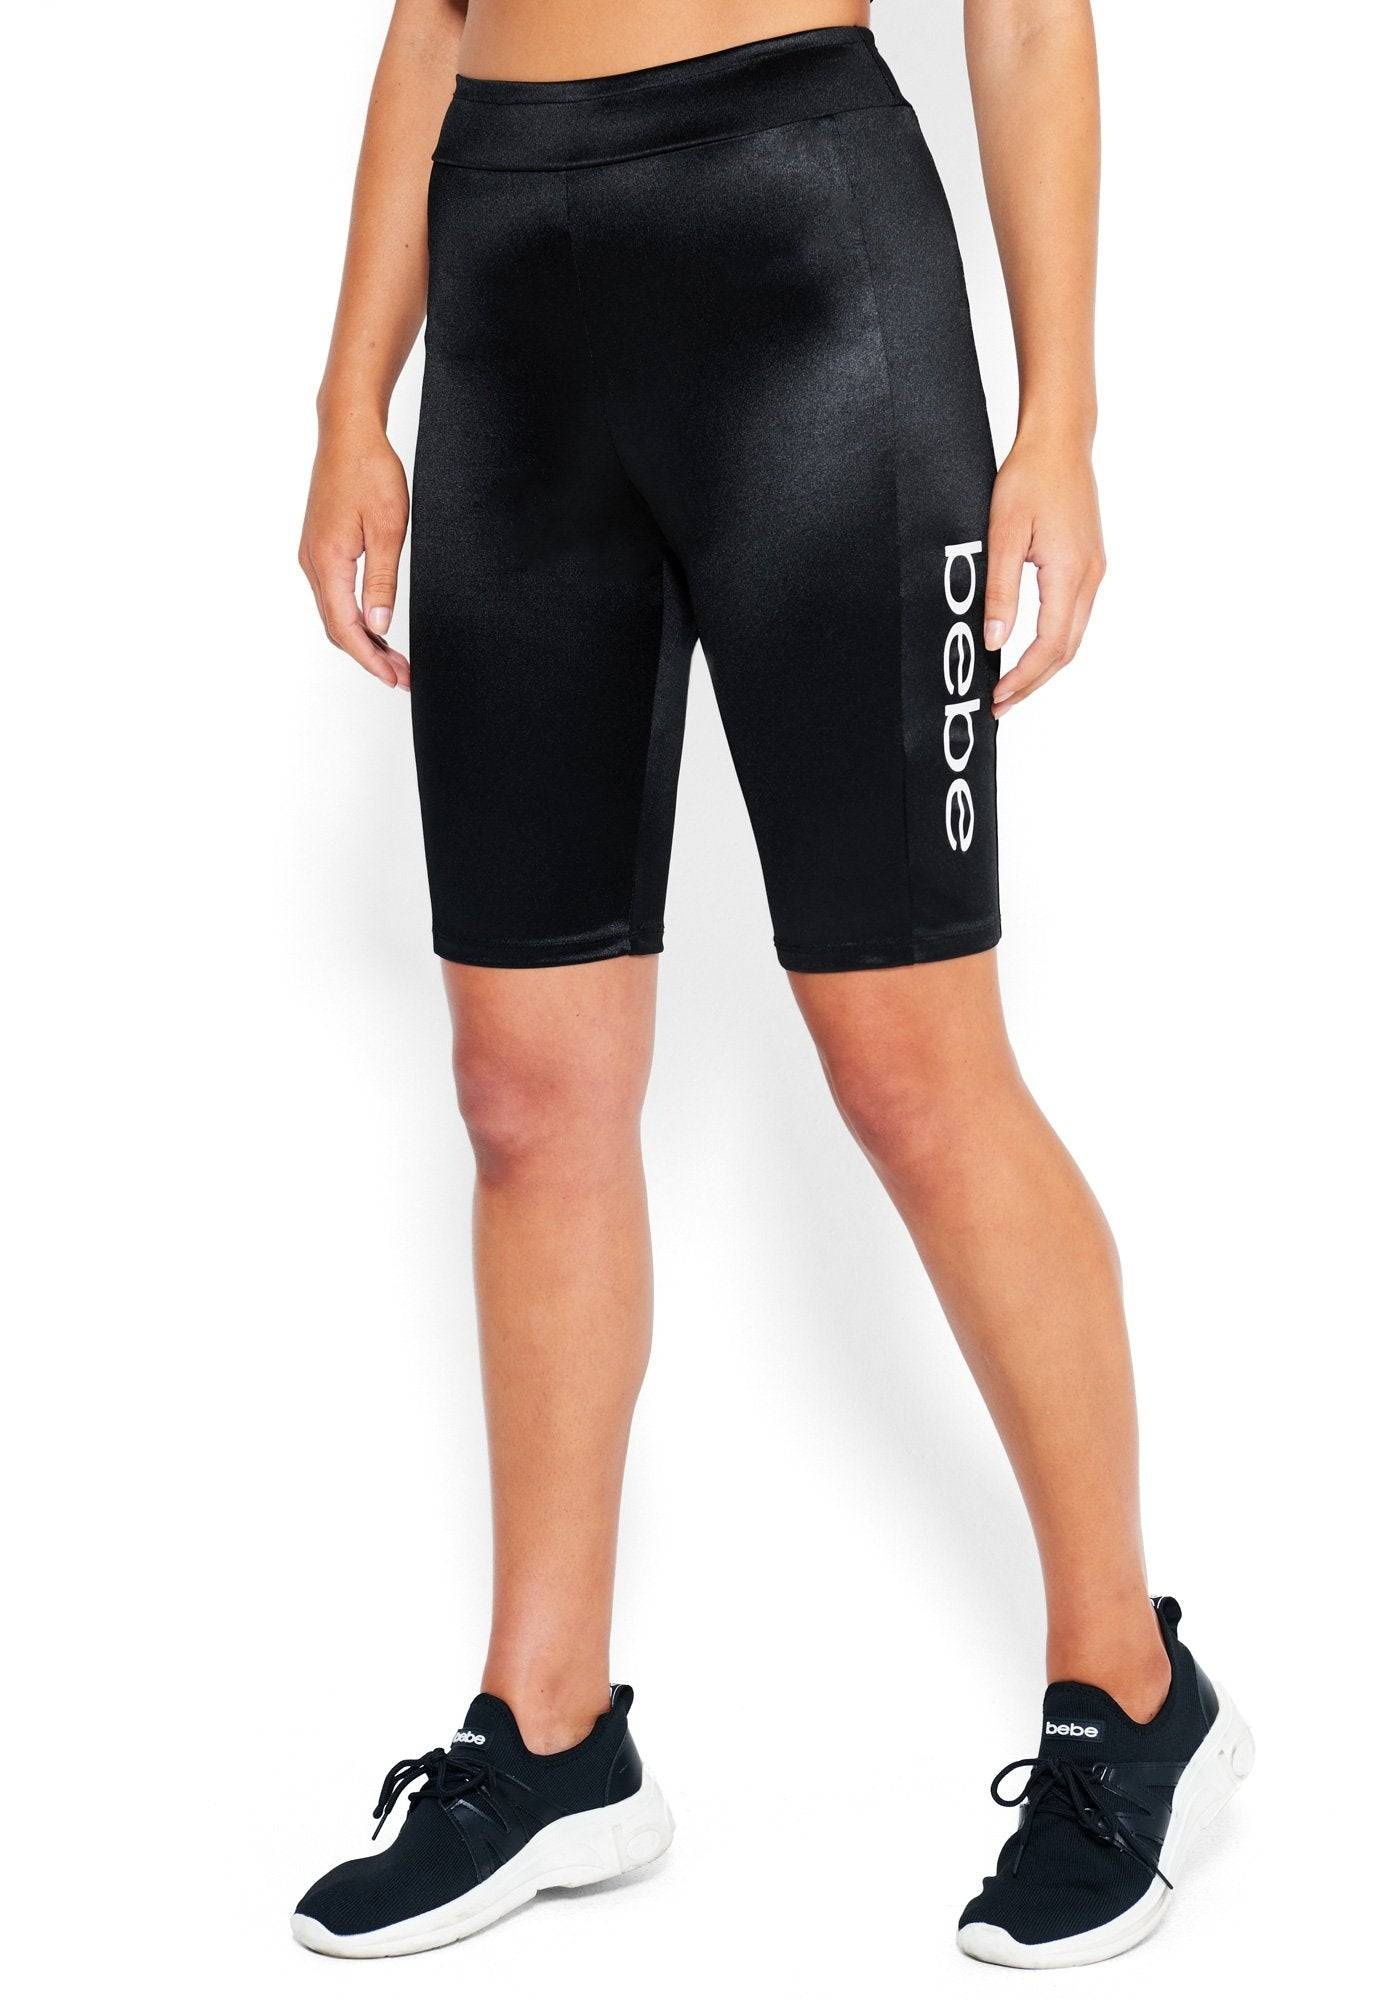 bebe Women's Mya Bebe Logo Bike Shorts, Size Medium in Black Spandex